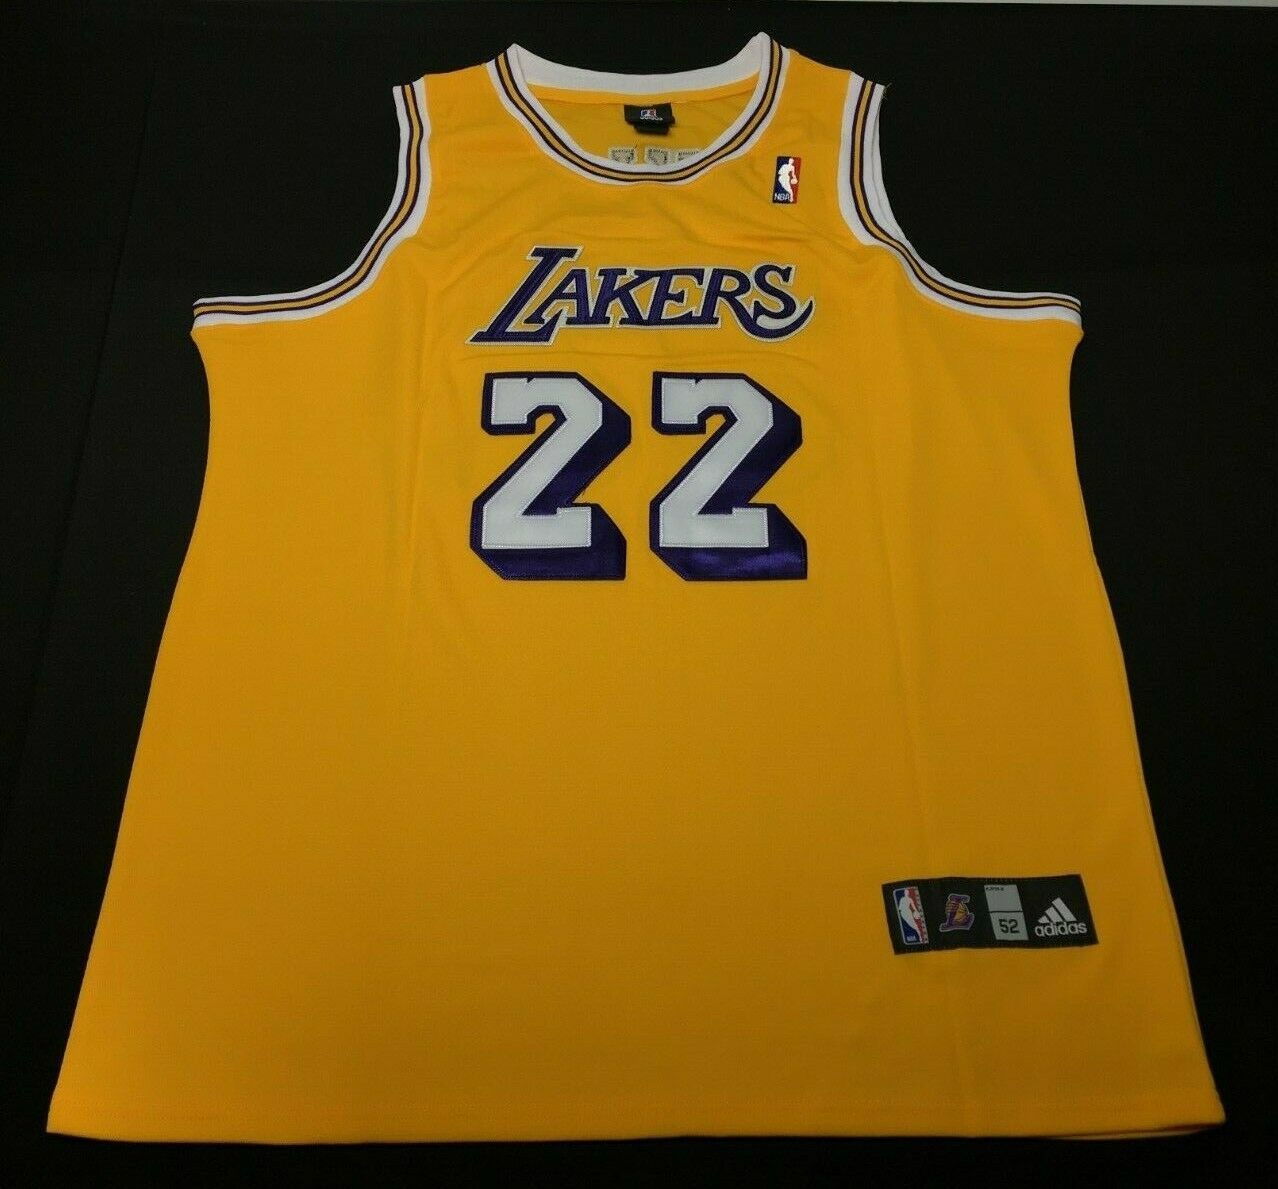 Elgin Baylor Signed Los Angeles Lakers Basketball Jersey *HOF PSA 3A27188